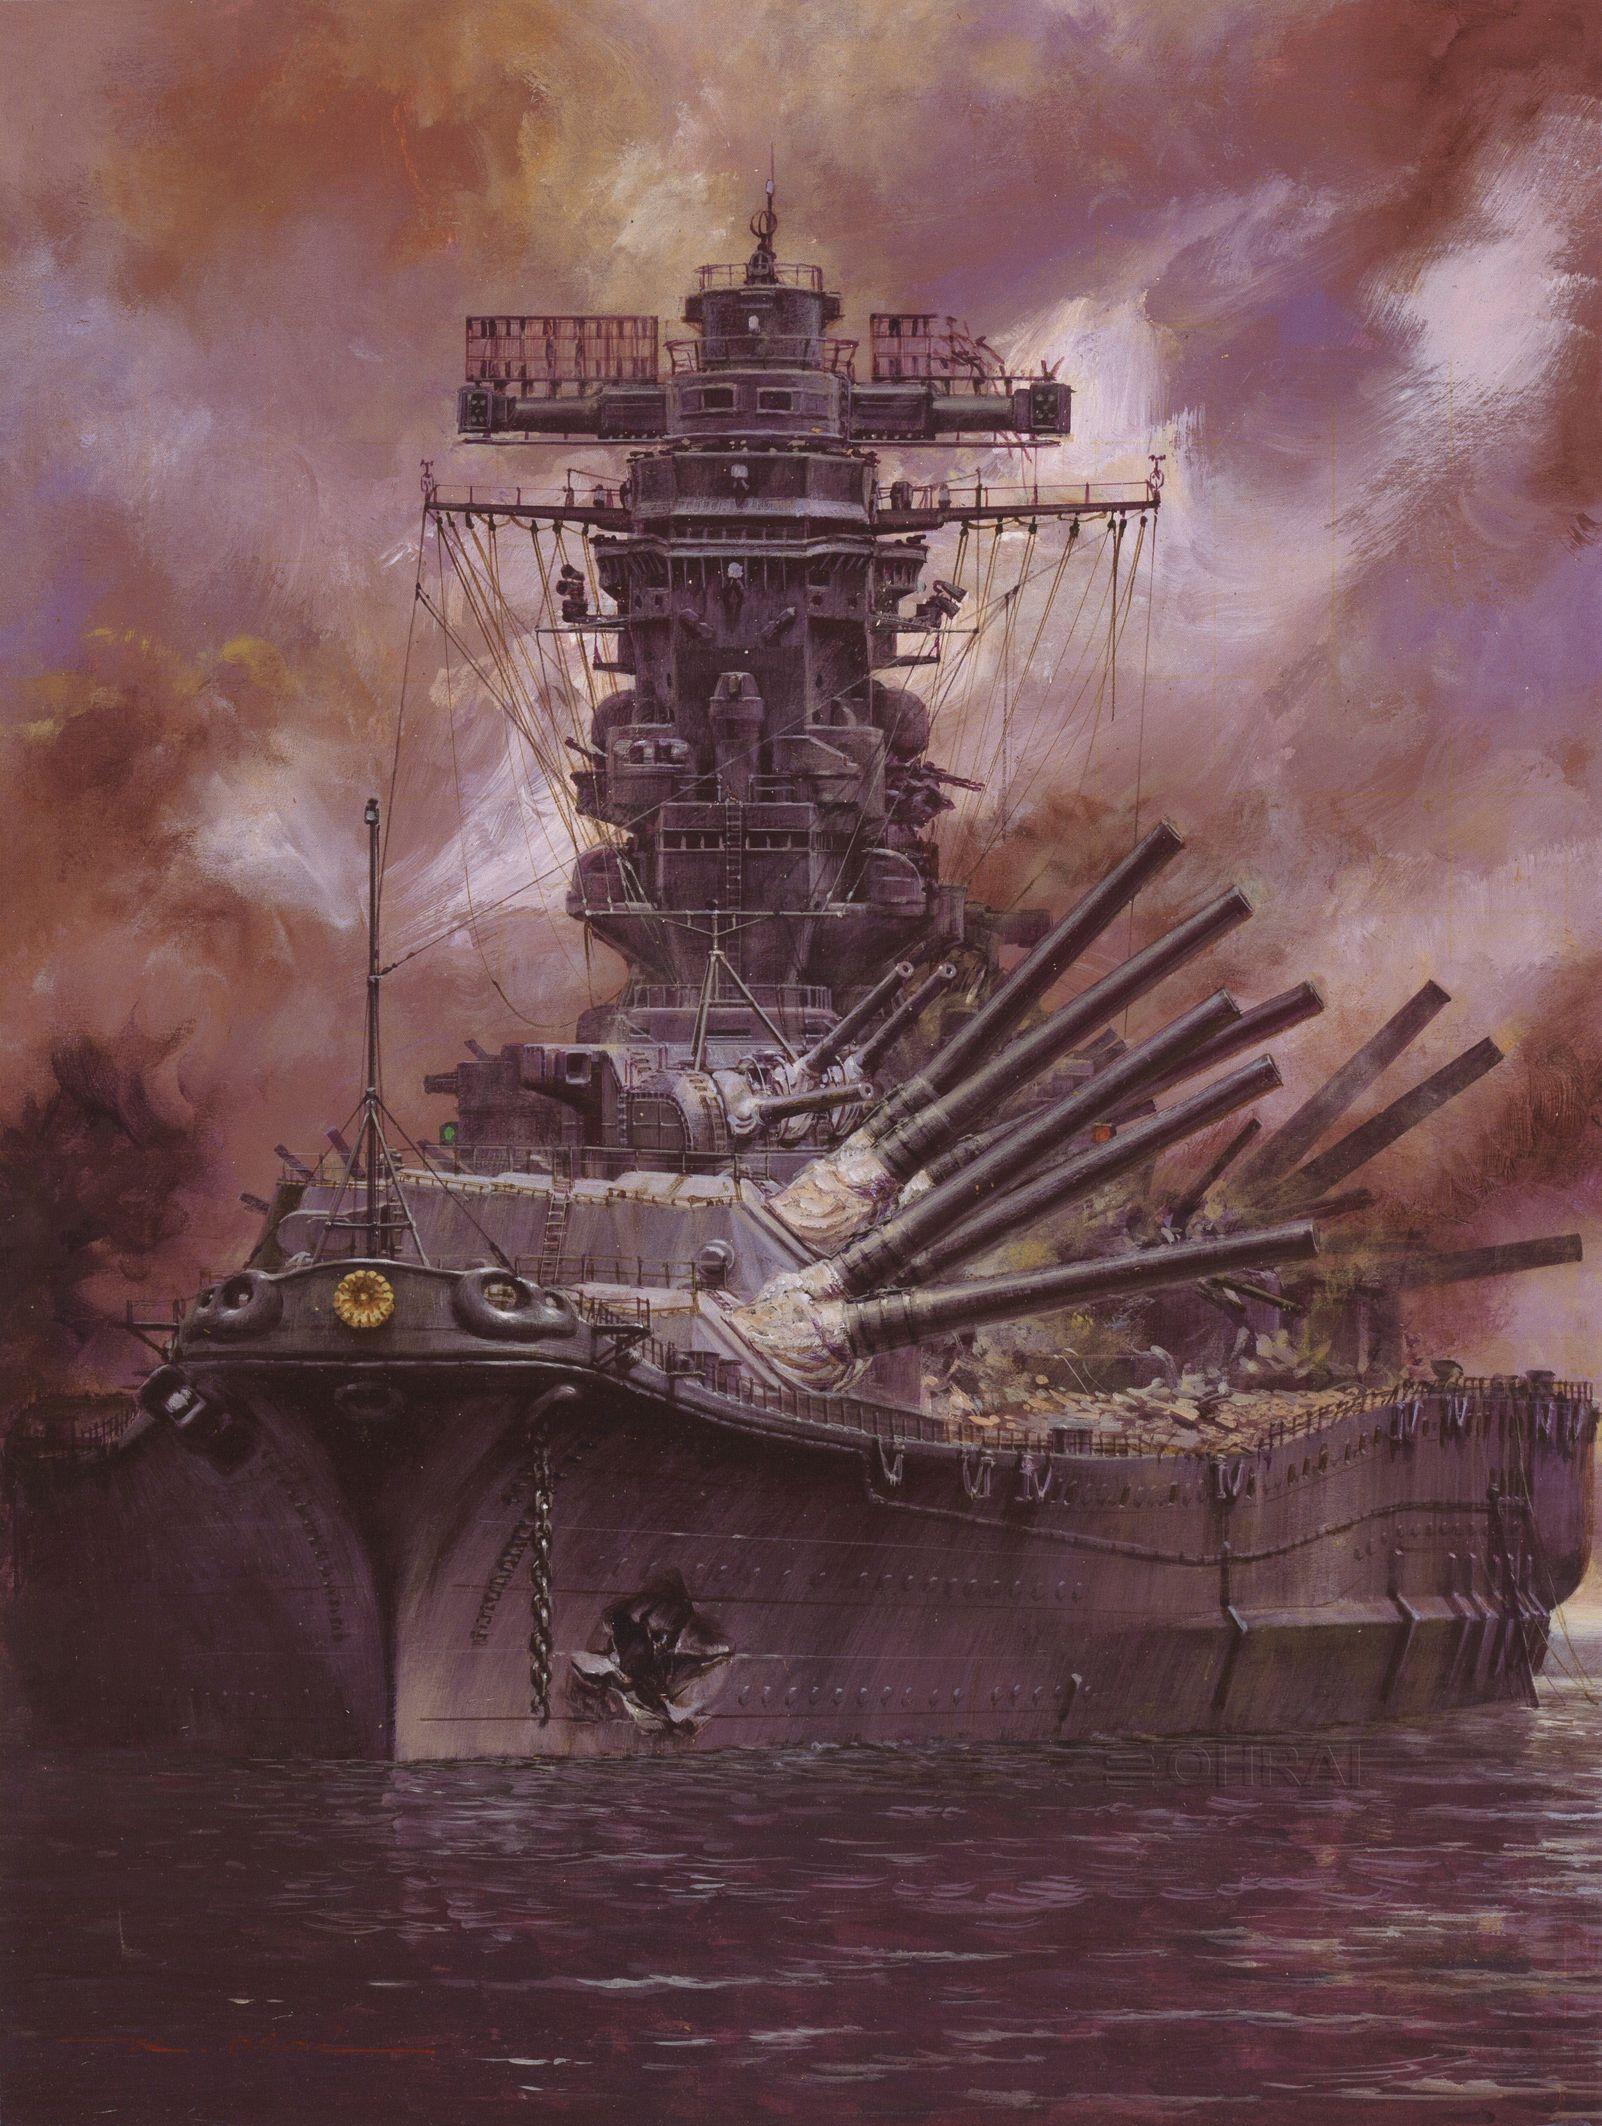 Data 生賴範義 Noriyoshi Ohrai 1997 1 15 戦艦大和 Battleship